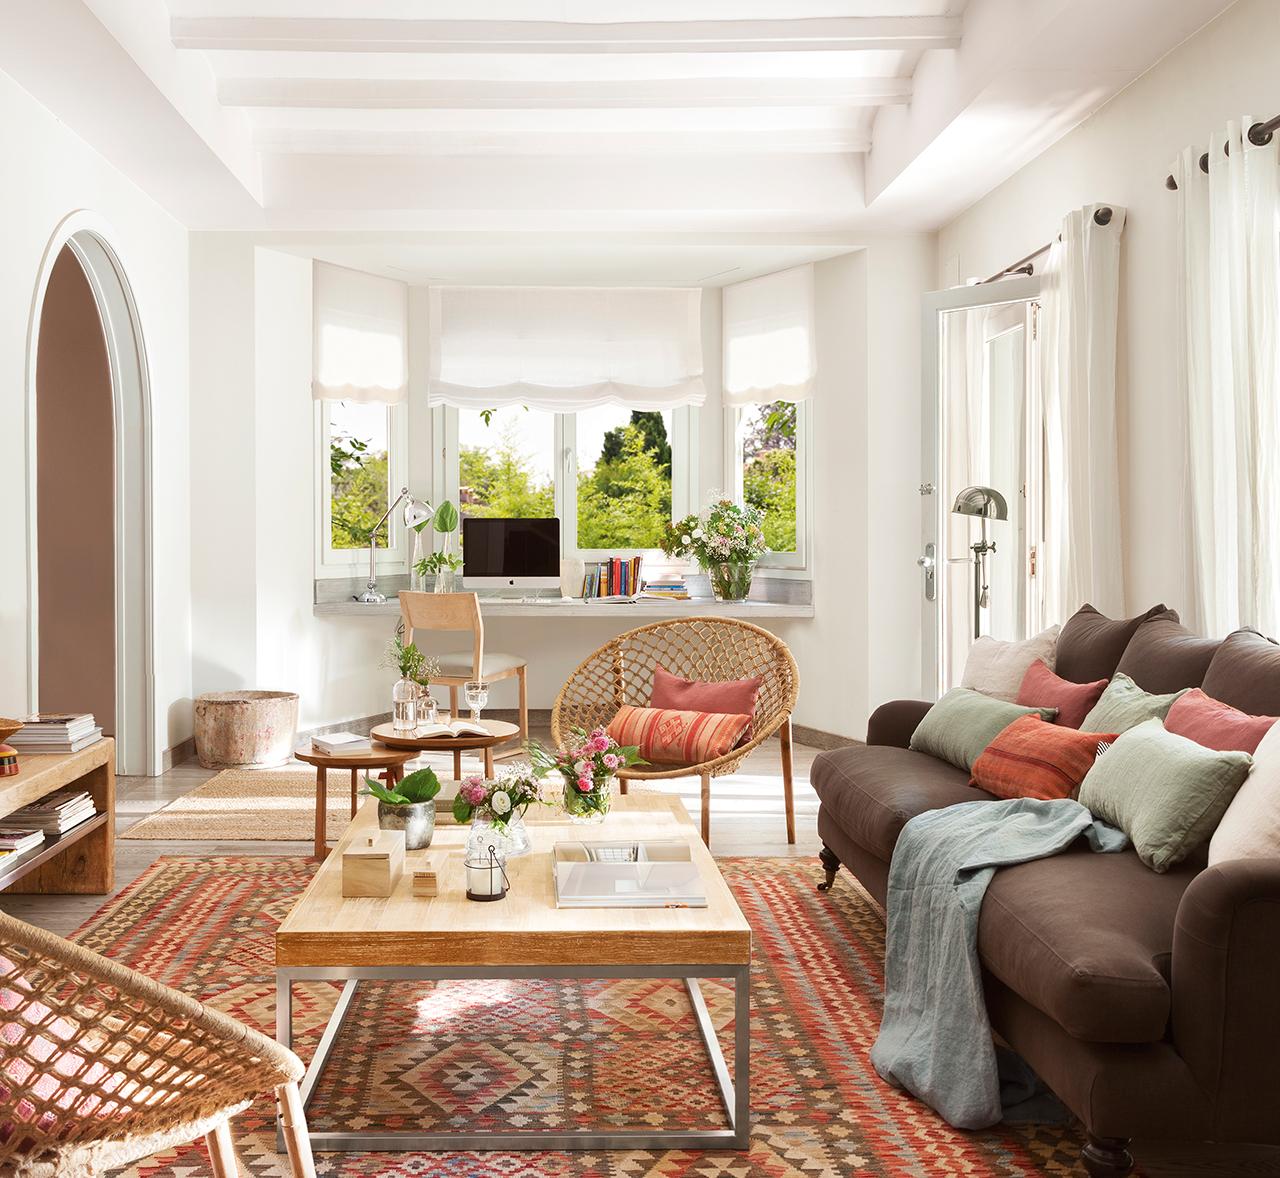 Muebles venecia obtenga ideas dise o de muebles para su hogar aqu - El mercader de venecia muebles outlet ...